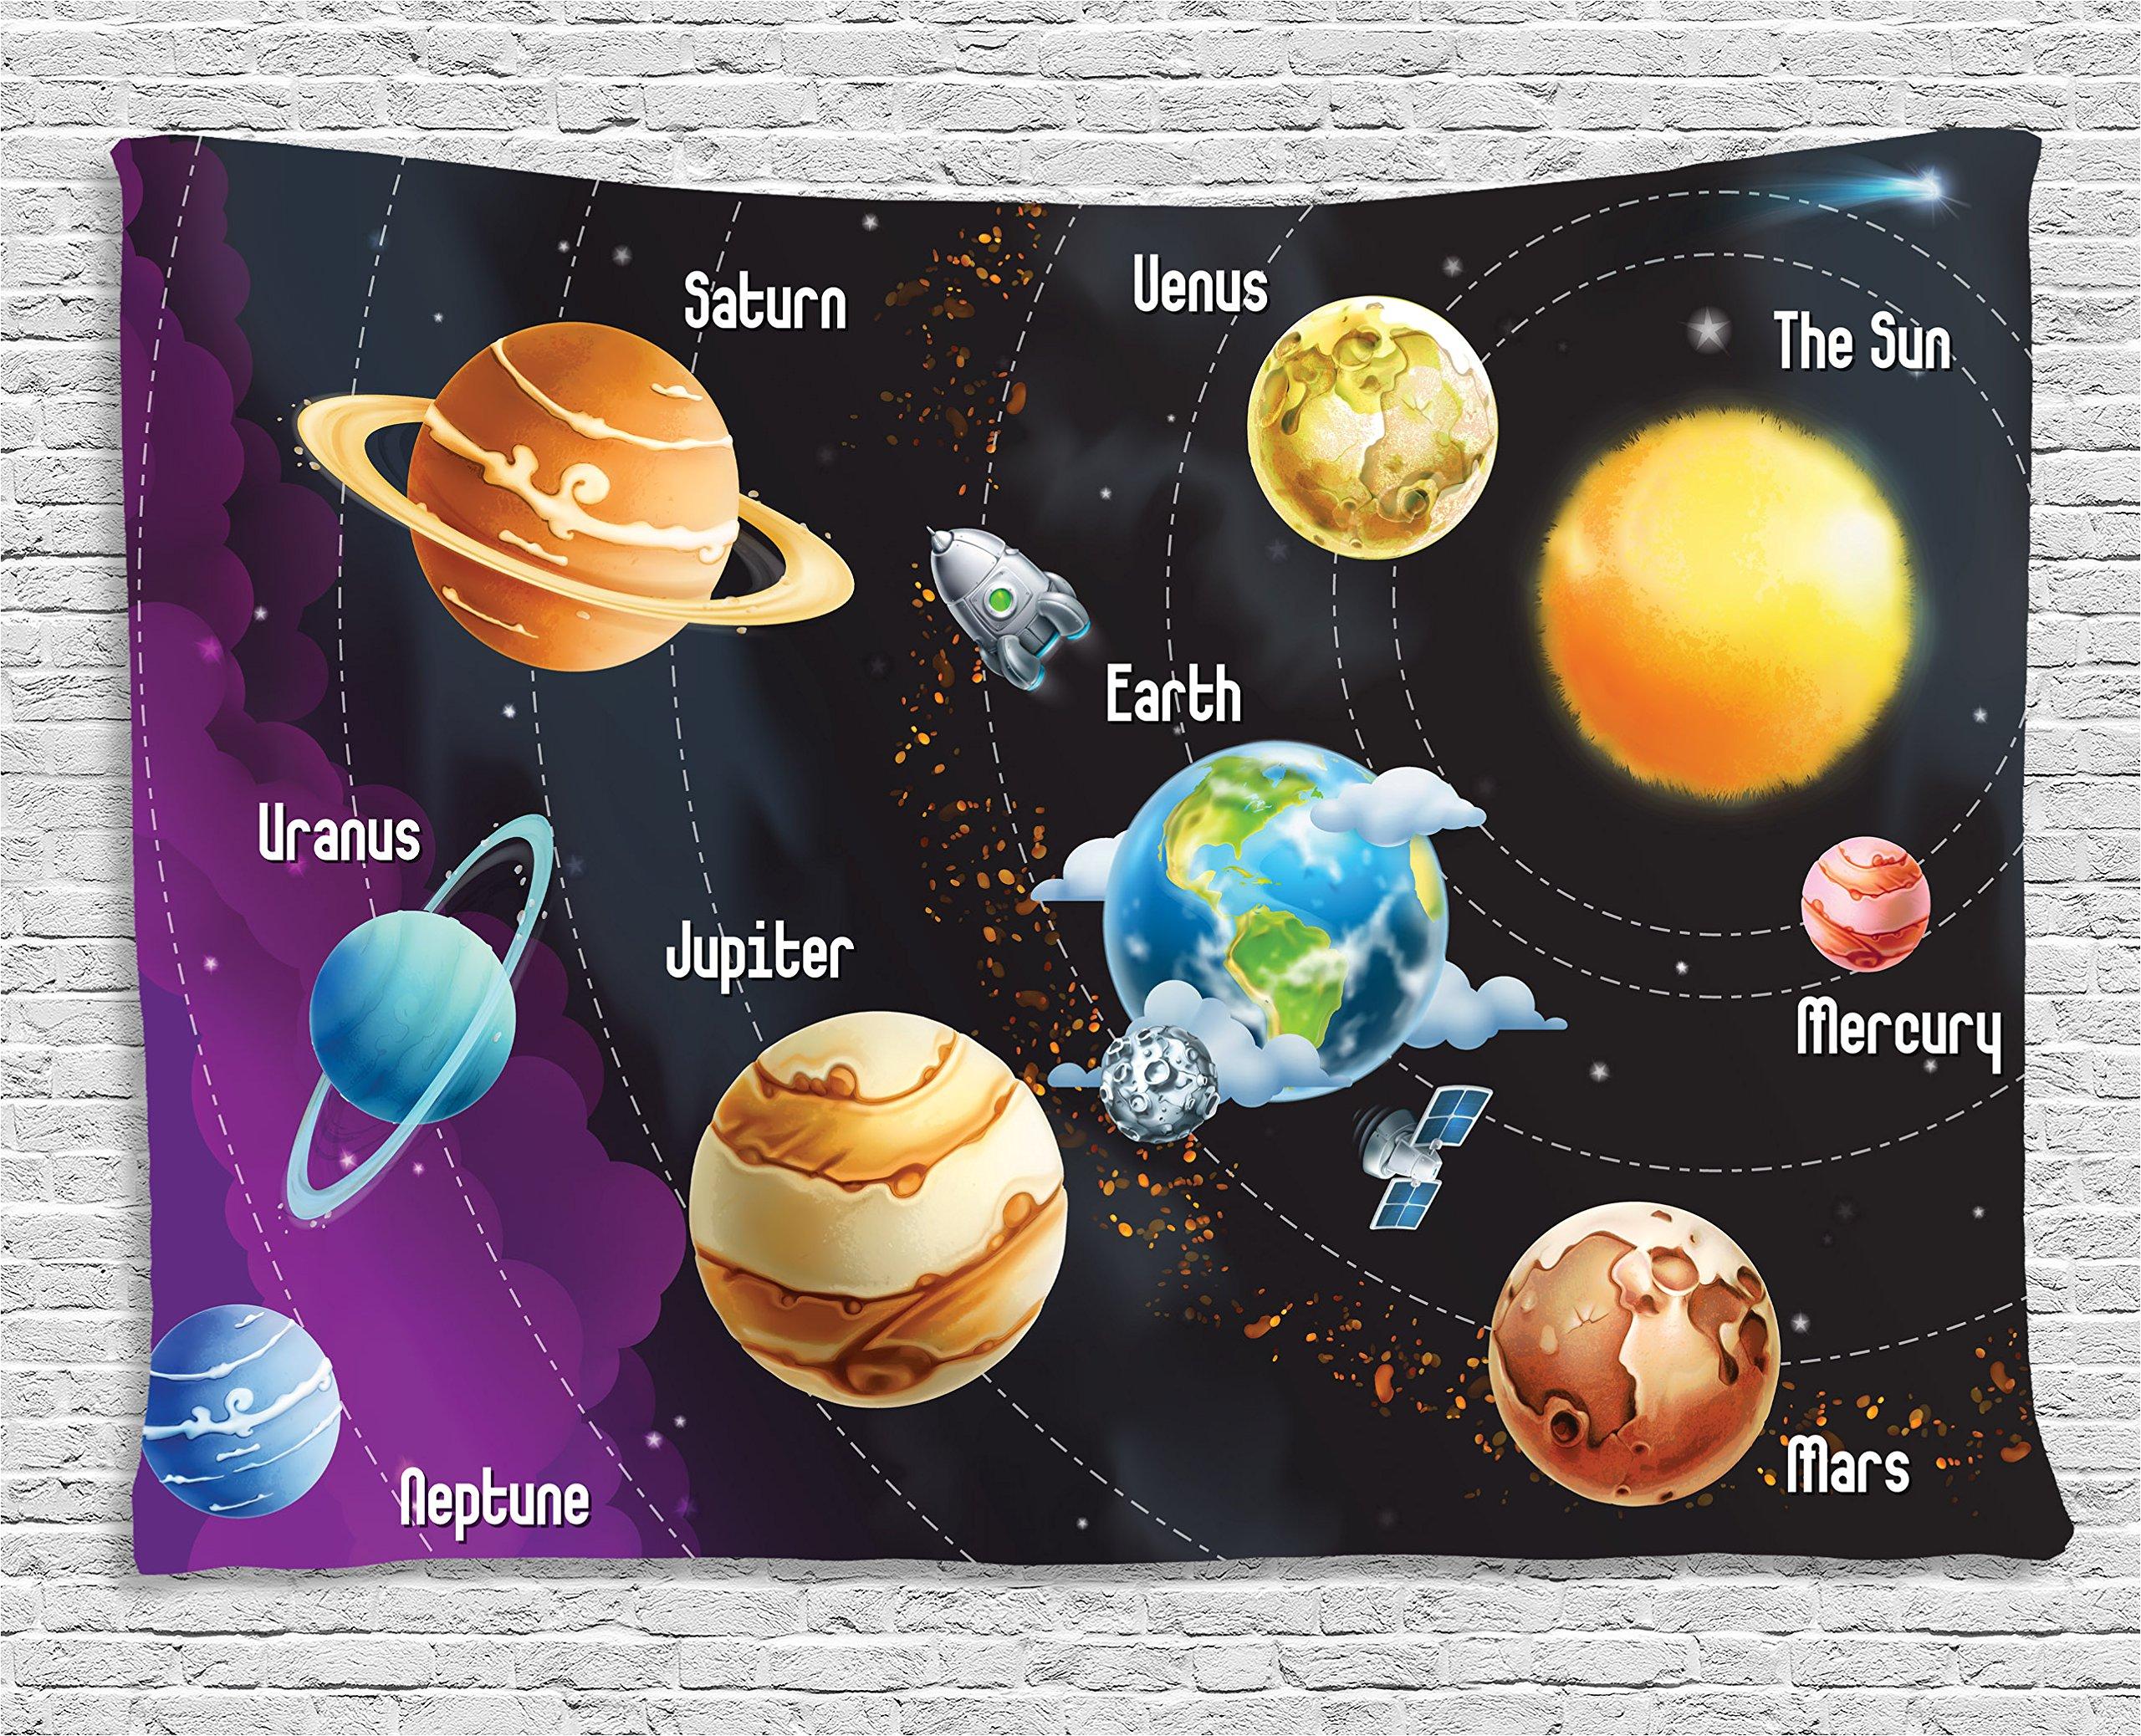 Ambesonne Planet Tapestry Universe Space Decor, Educational Solar System Planets Neptune Venus Mercury Kids Science Room Horizontal Art, Bedroom Living Room Dorm Wall Hanging, 80 W X 60 L, Multi